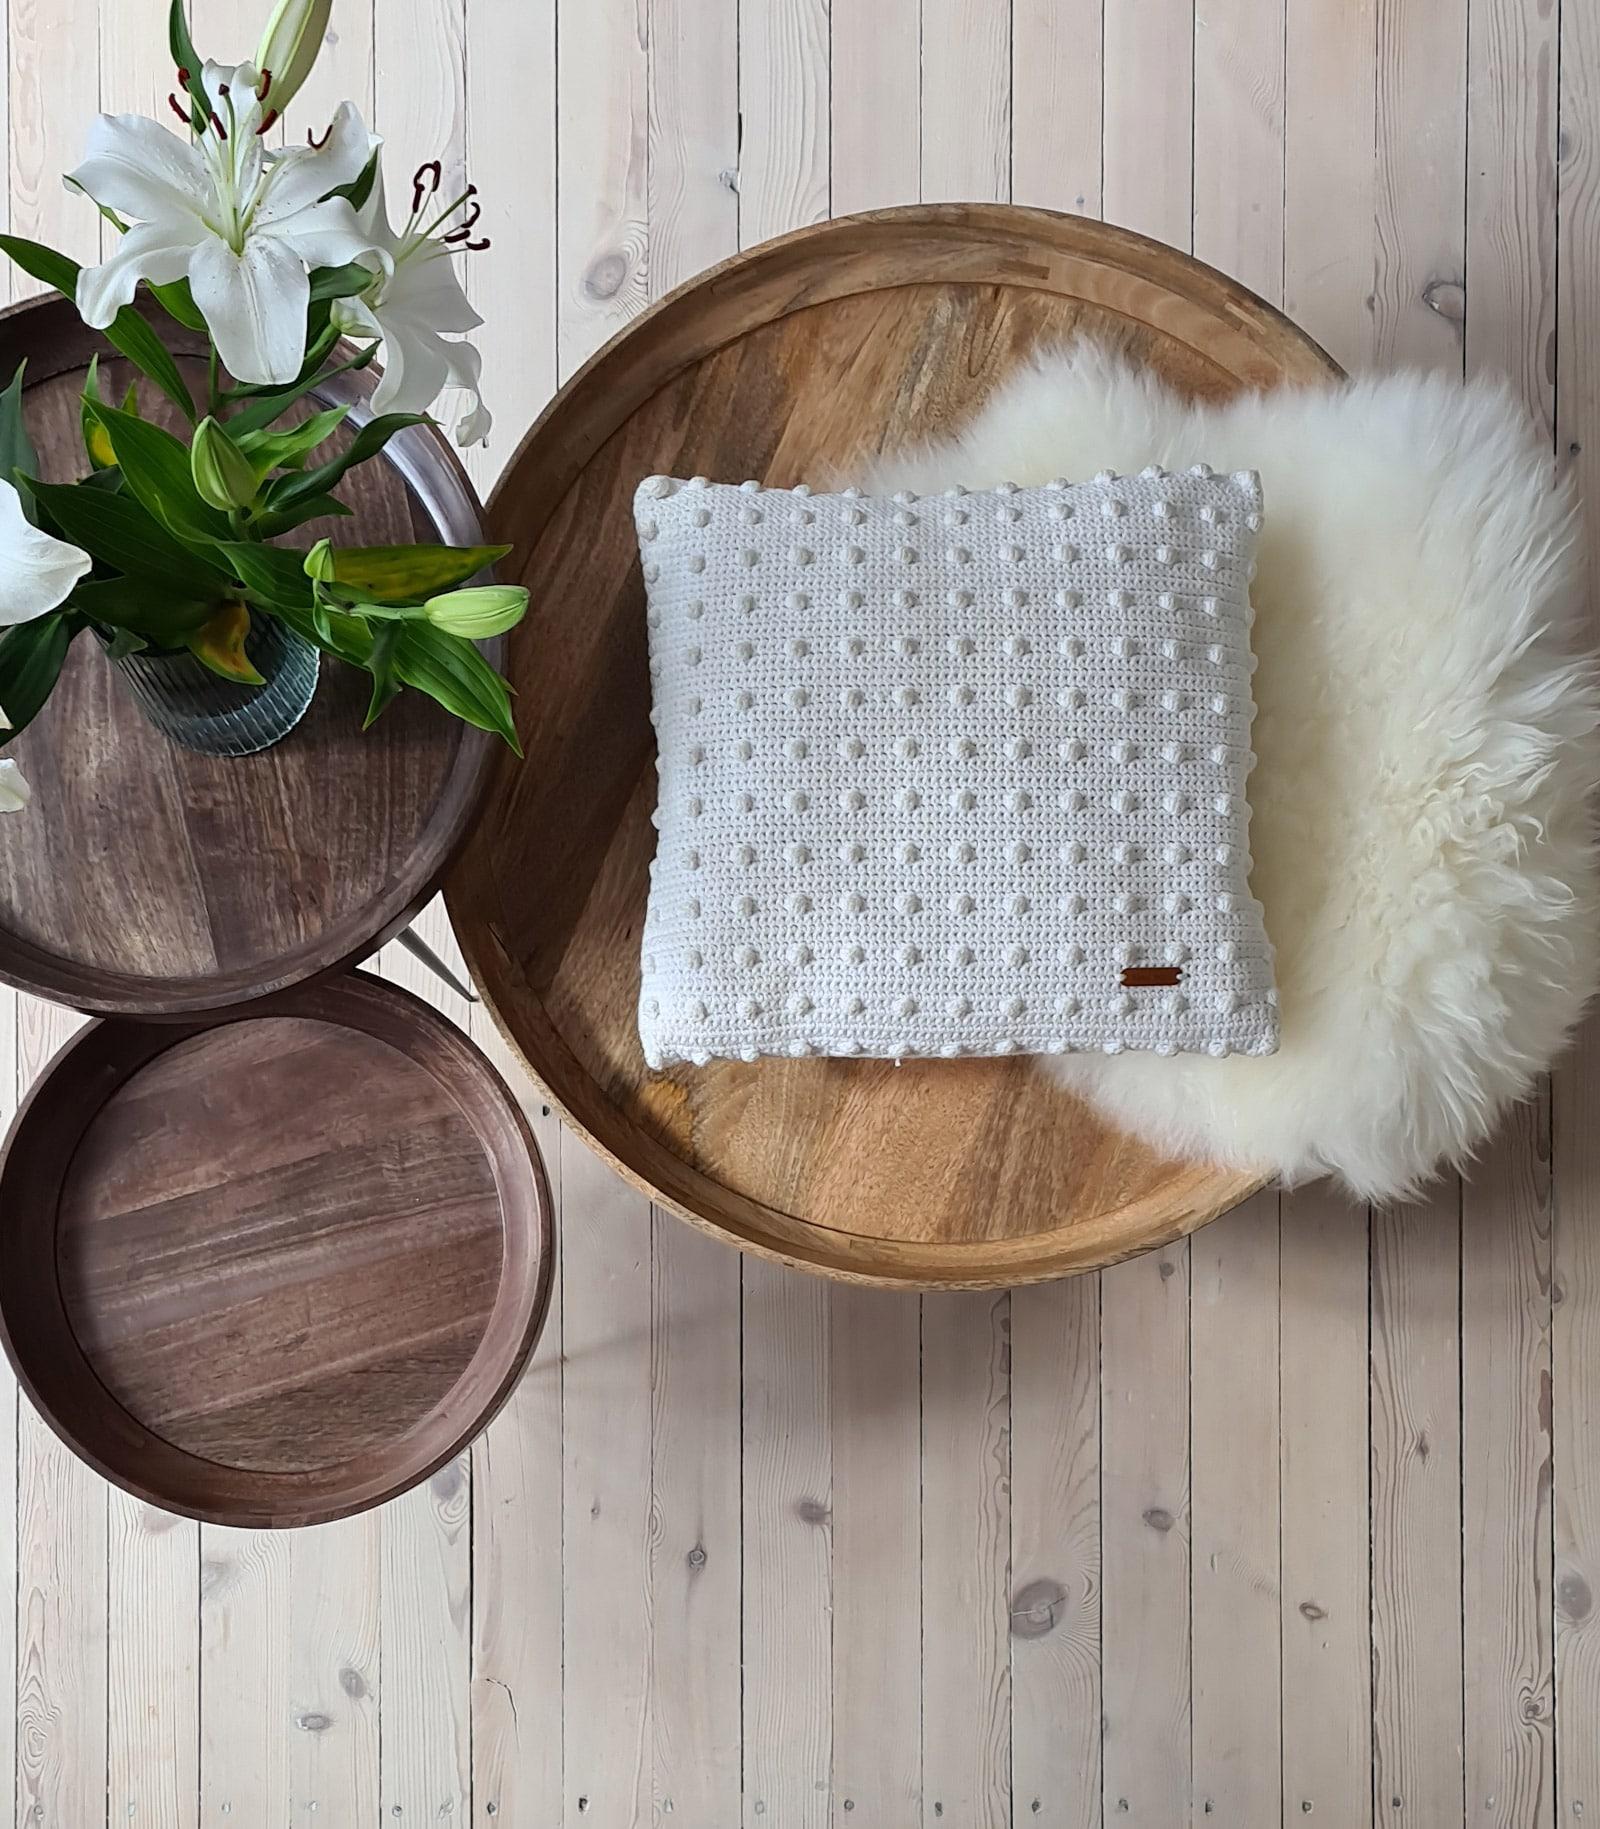 Free pattern by Milla Billa